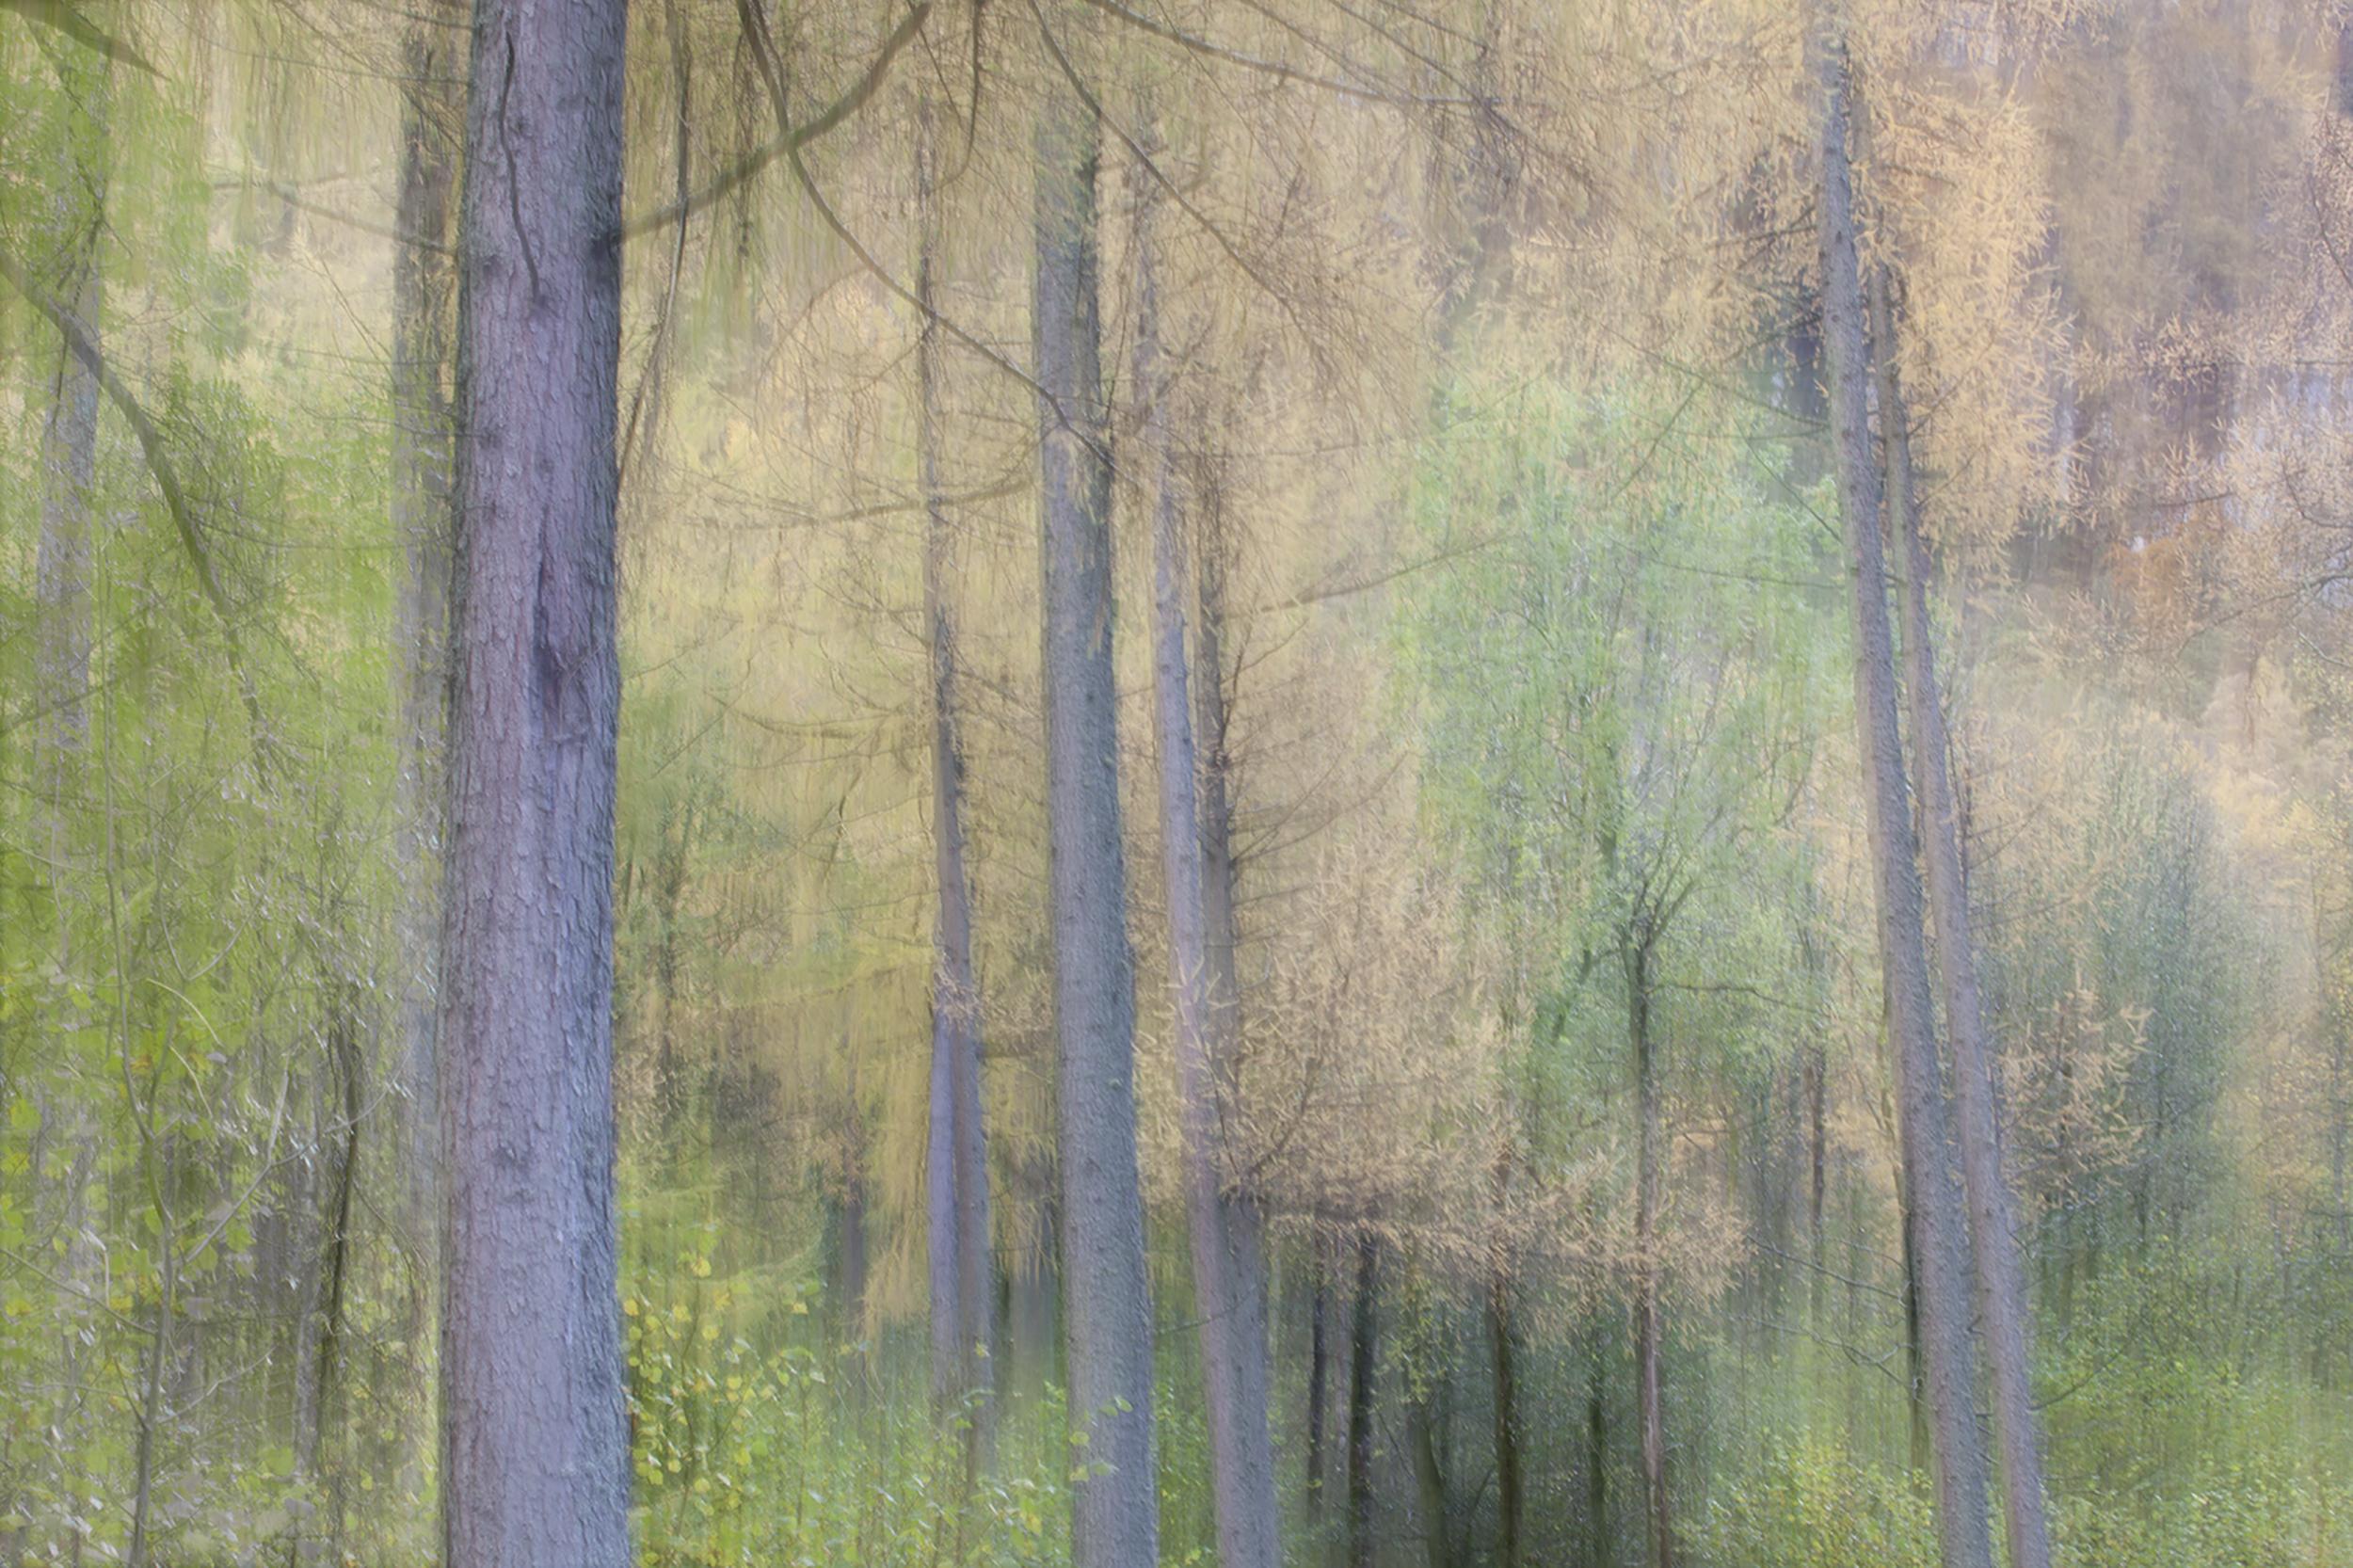 The Woods in Autumn 2.jpg